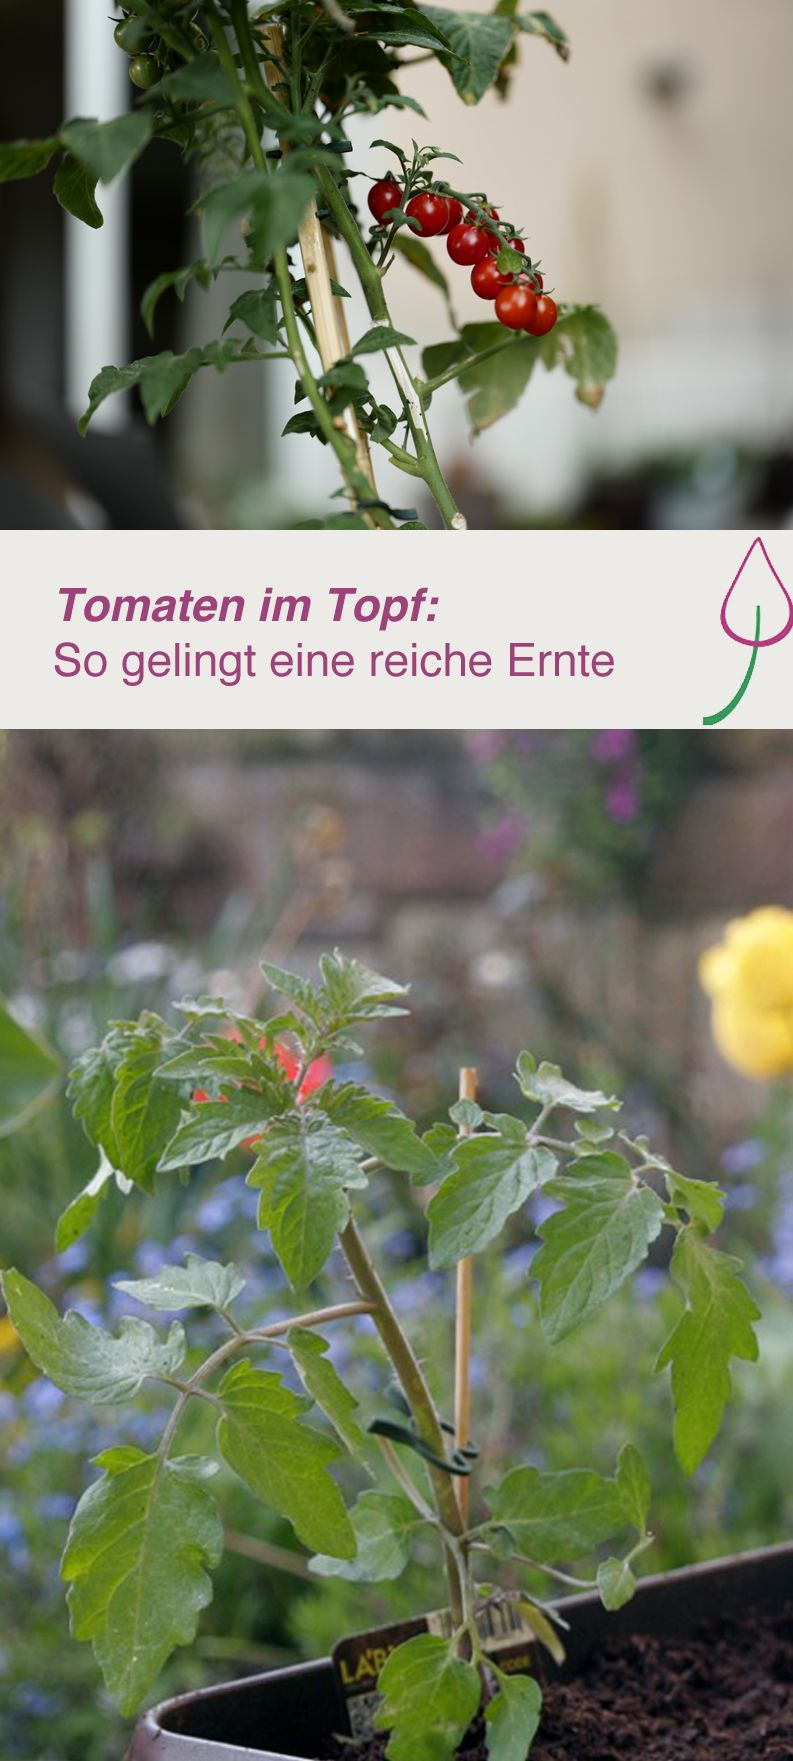 Tomaten Richtig In Kubel Pflanzen Tomaten Pflanzen Balkon Tomaten Garten Tomaten Pflanzen